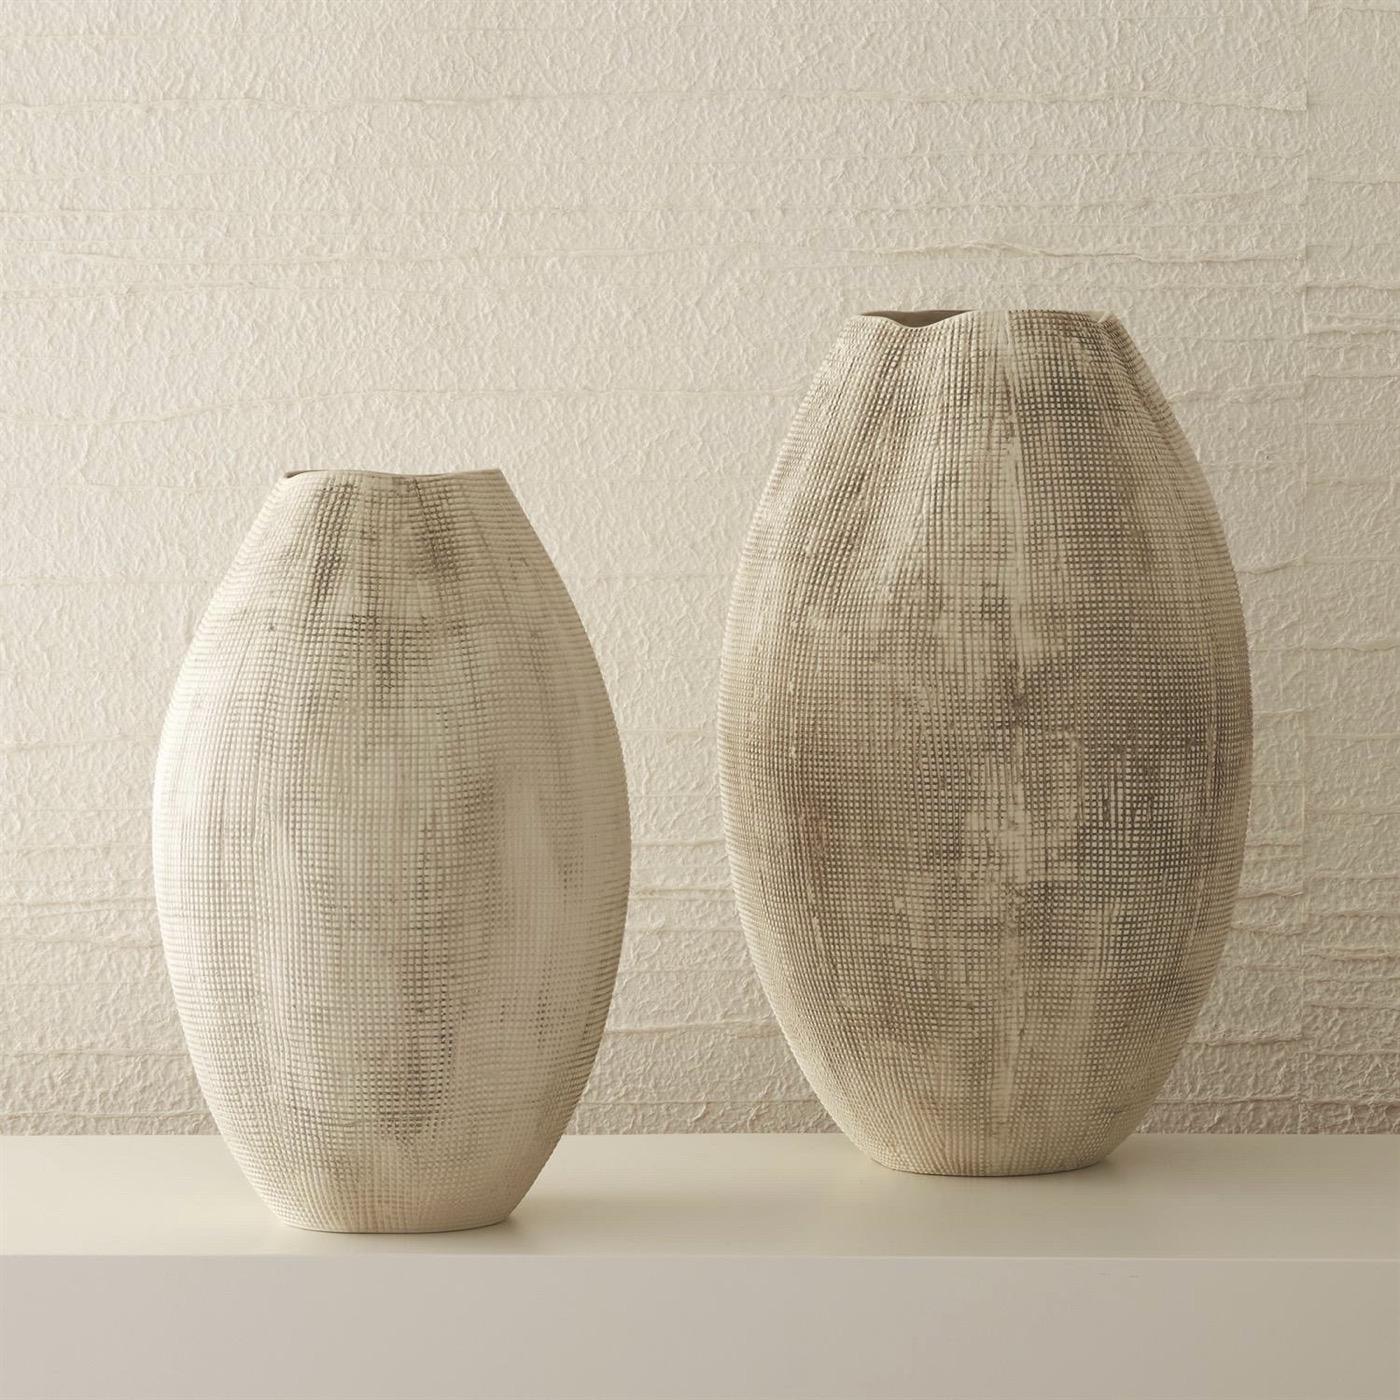 Gridley Ceramic Vases